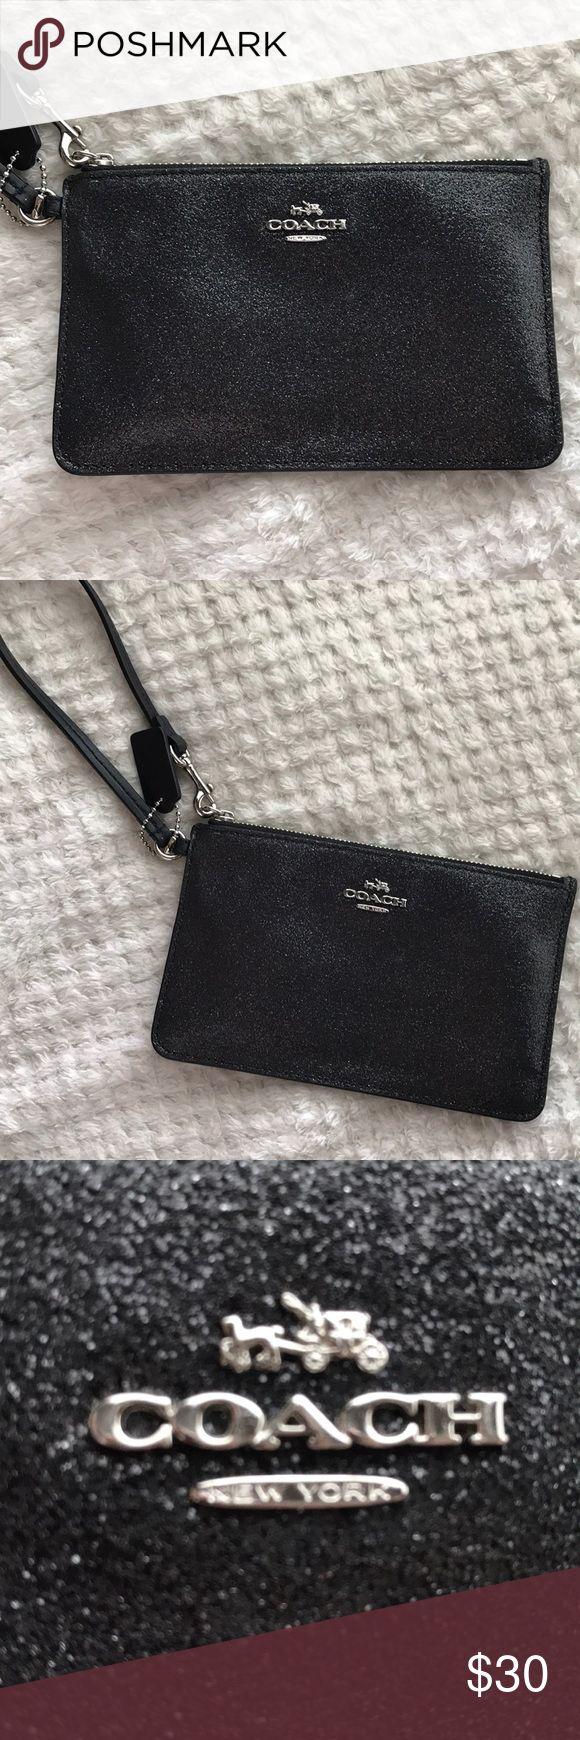 Glittery ✨ Coach Wristlet Authentic Coach Wristlet Dark Gray  Glittery Material Coach Bags Clutches & Wristlets